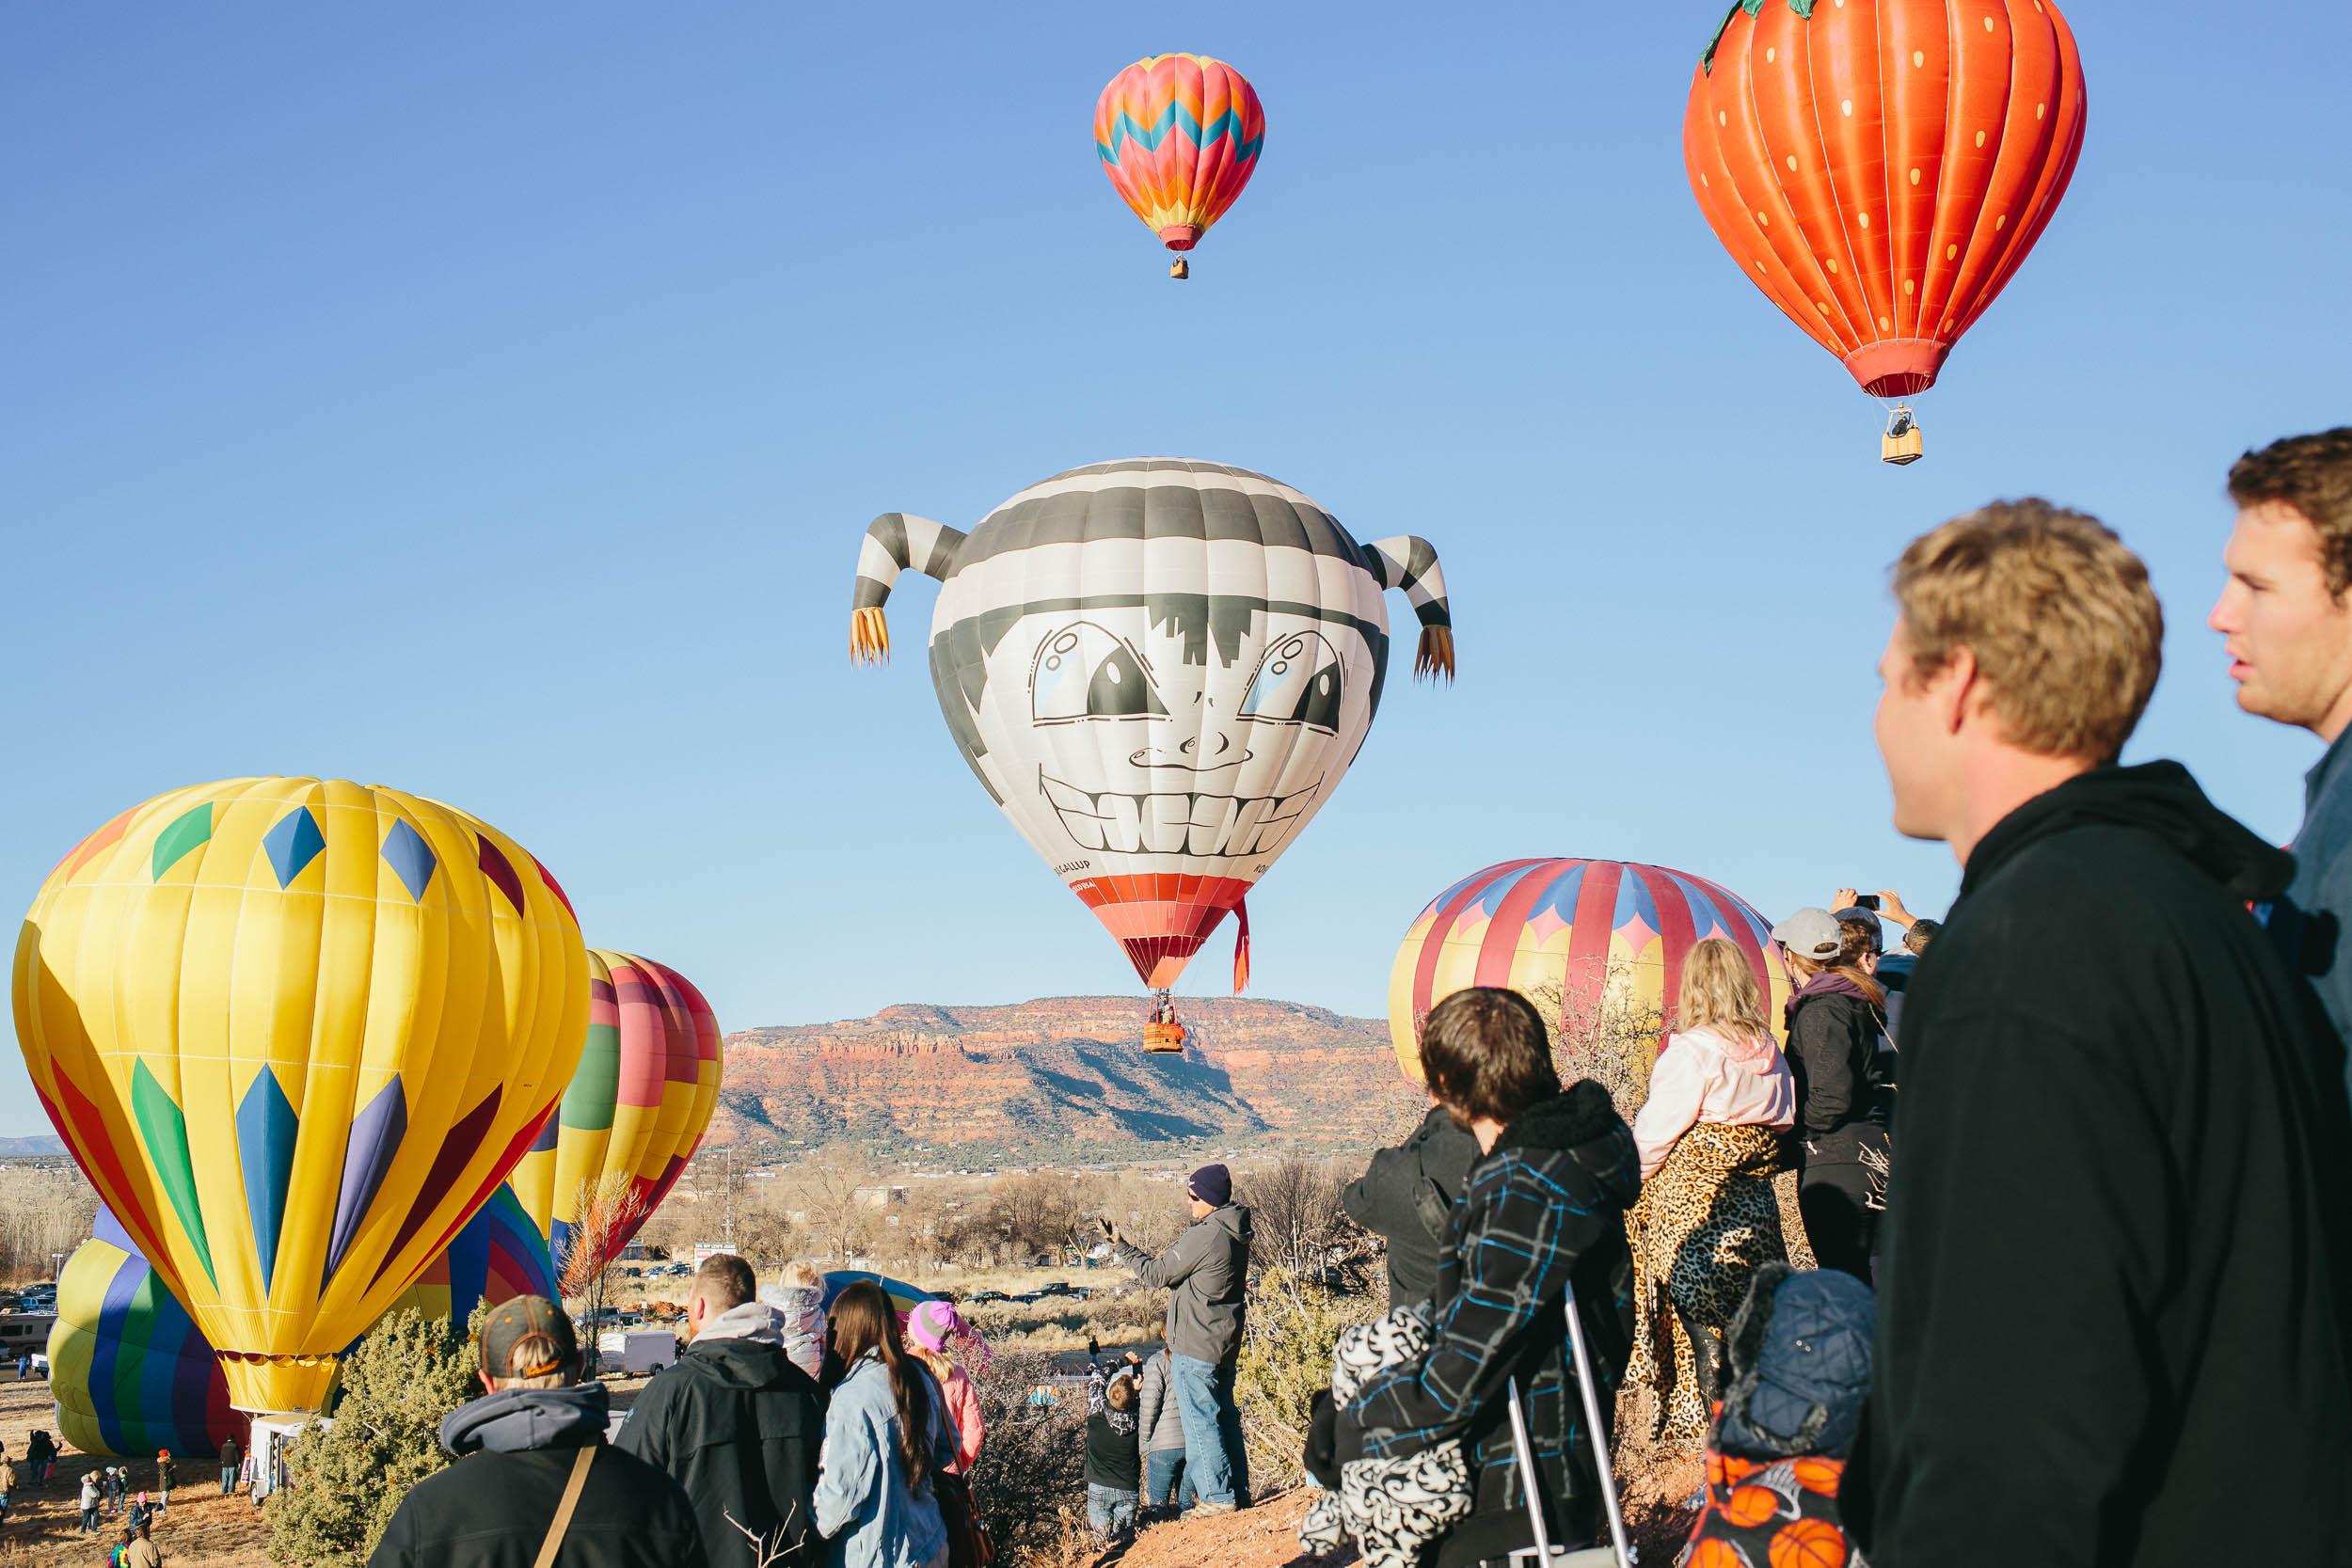 Kyle-Sheppard-Kanab-Balloon-Festival-20.jpg